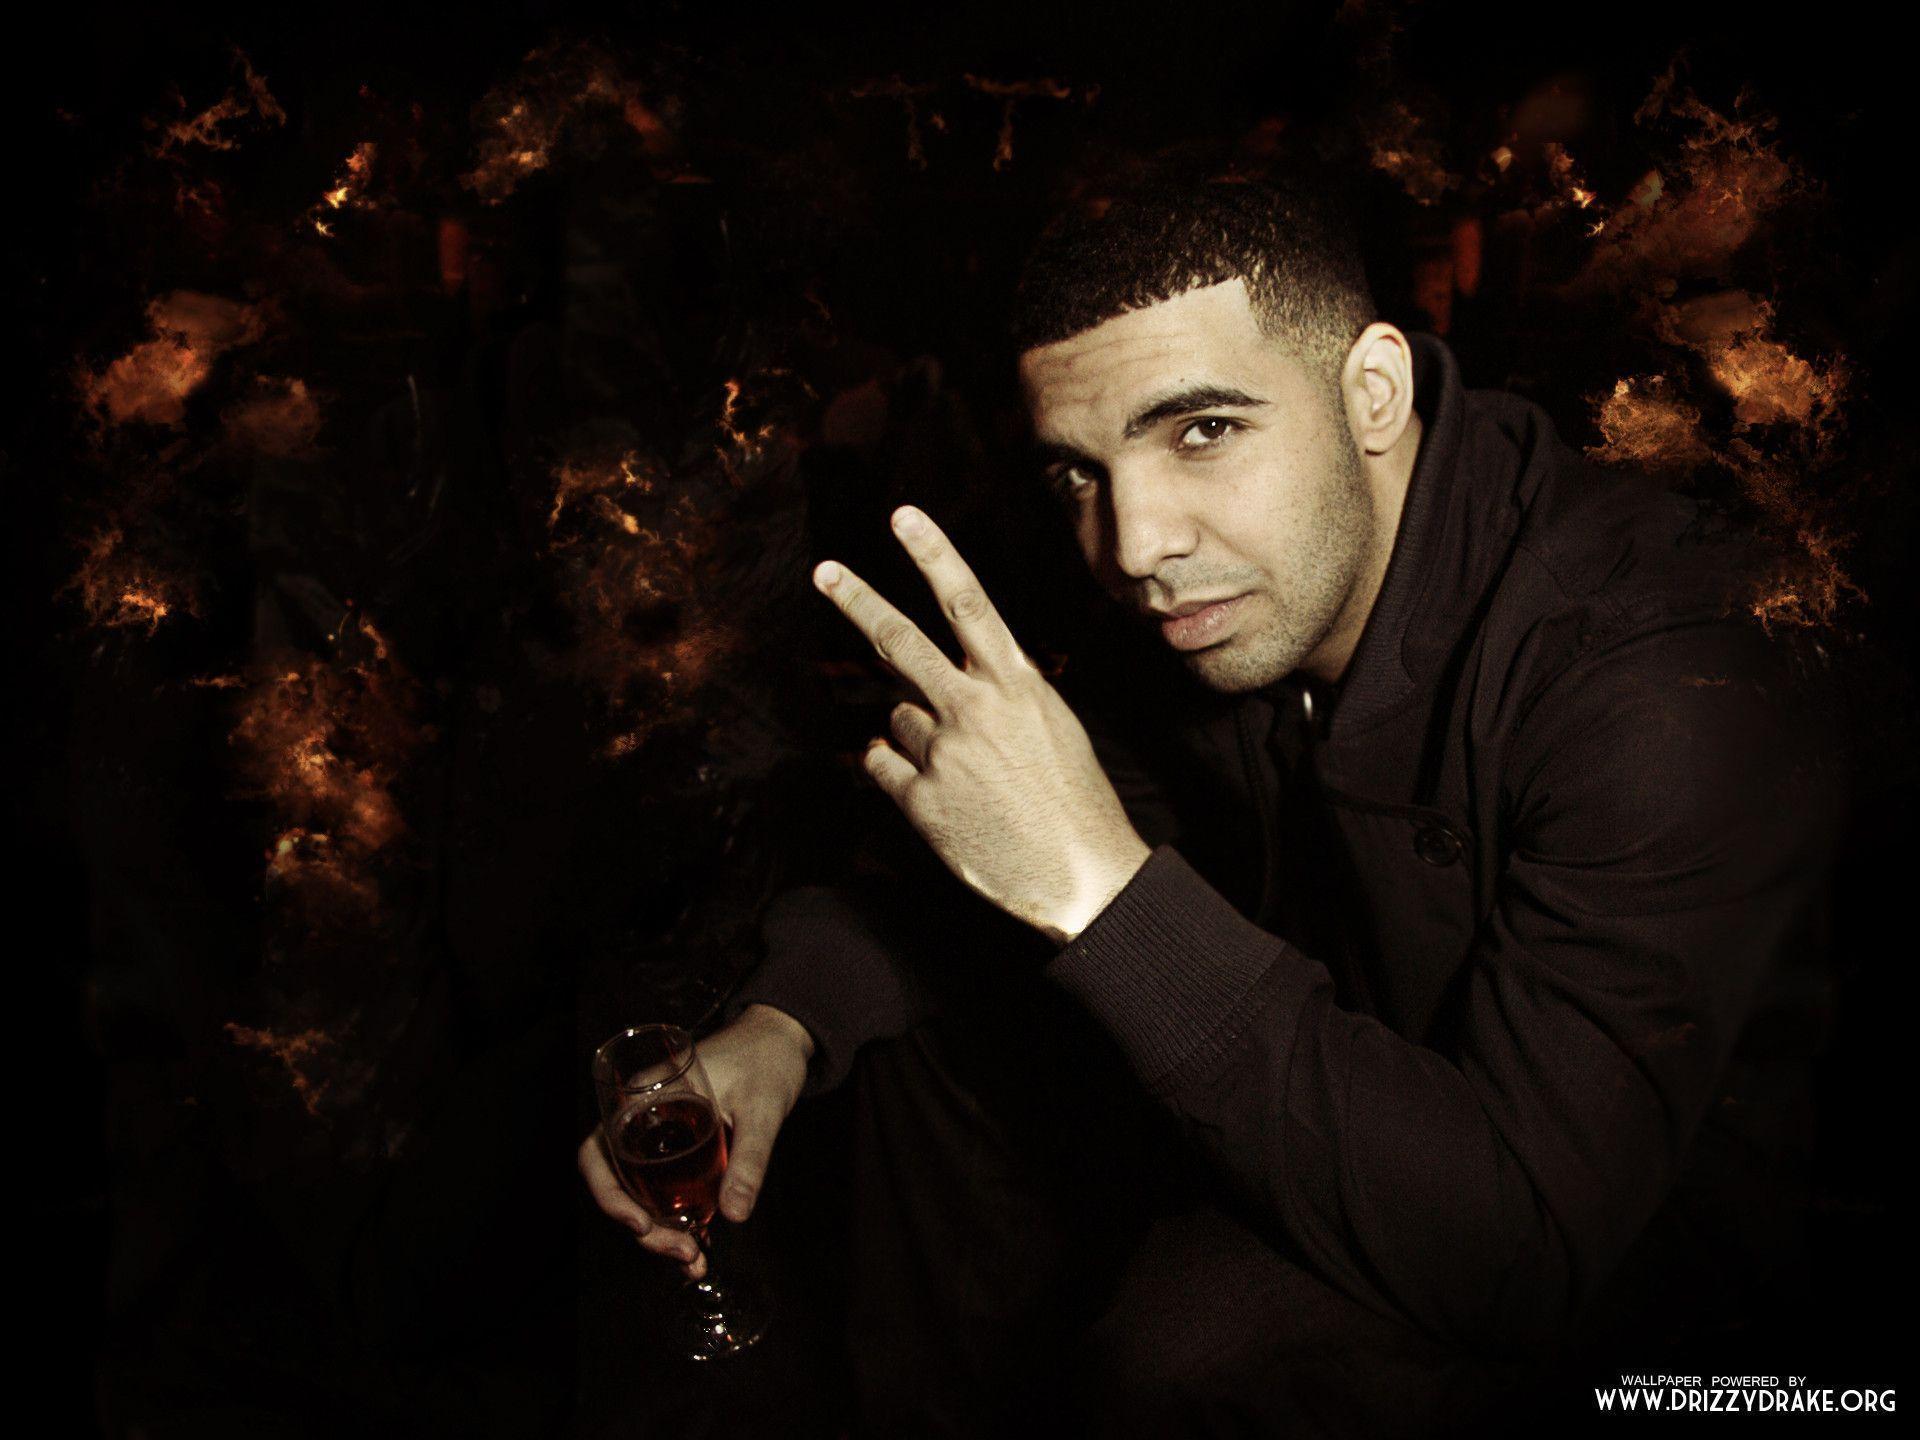 Drake wallpapers wallpaper cave - Drake views wallpaper ...